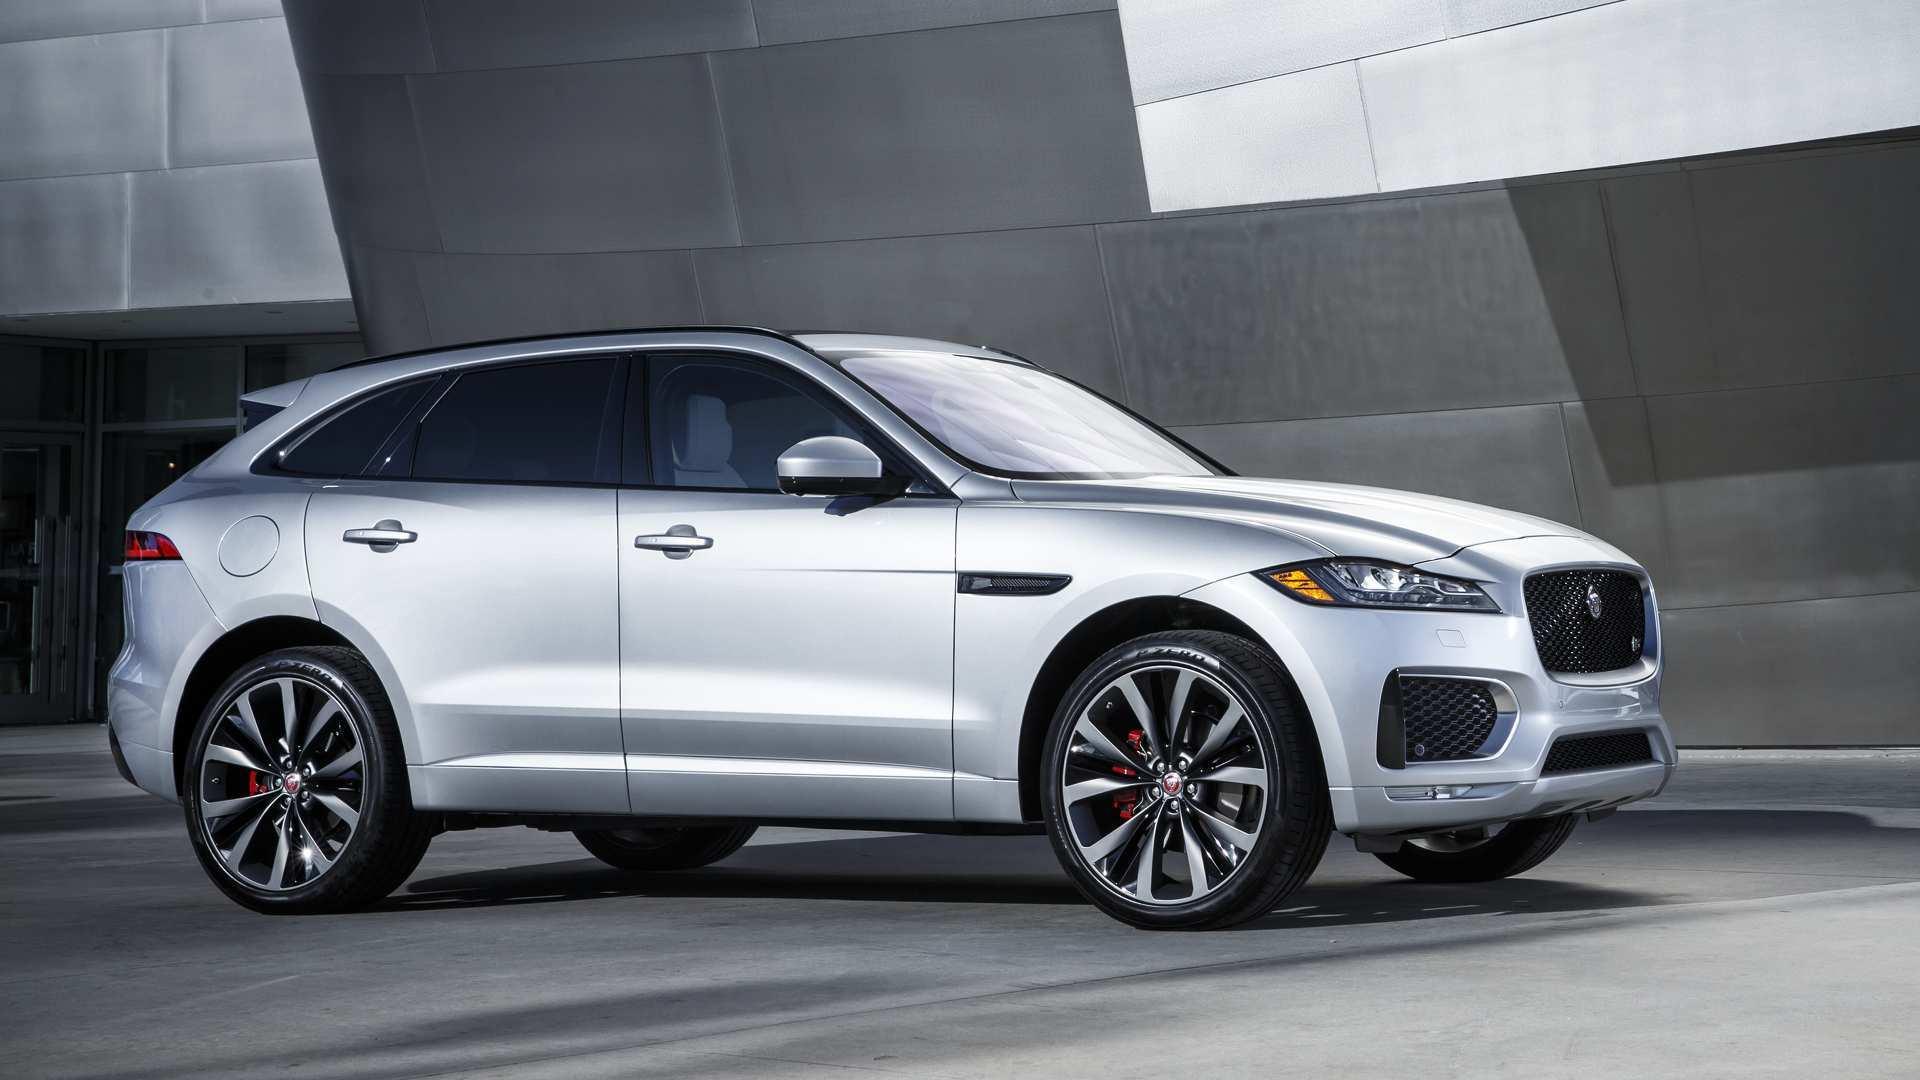 40 The Best Jaguar 2019 F Pace Review New Review Images with Best Jaguar 2019 F Pace Review New Review